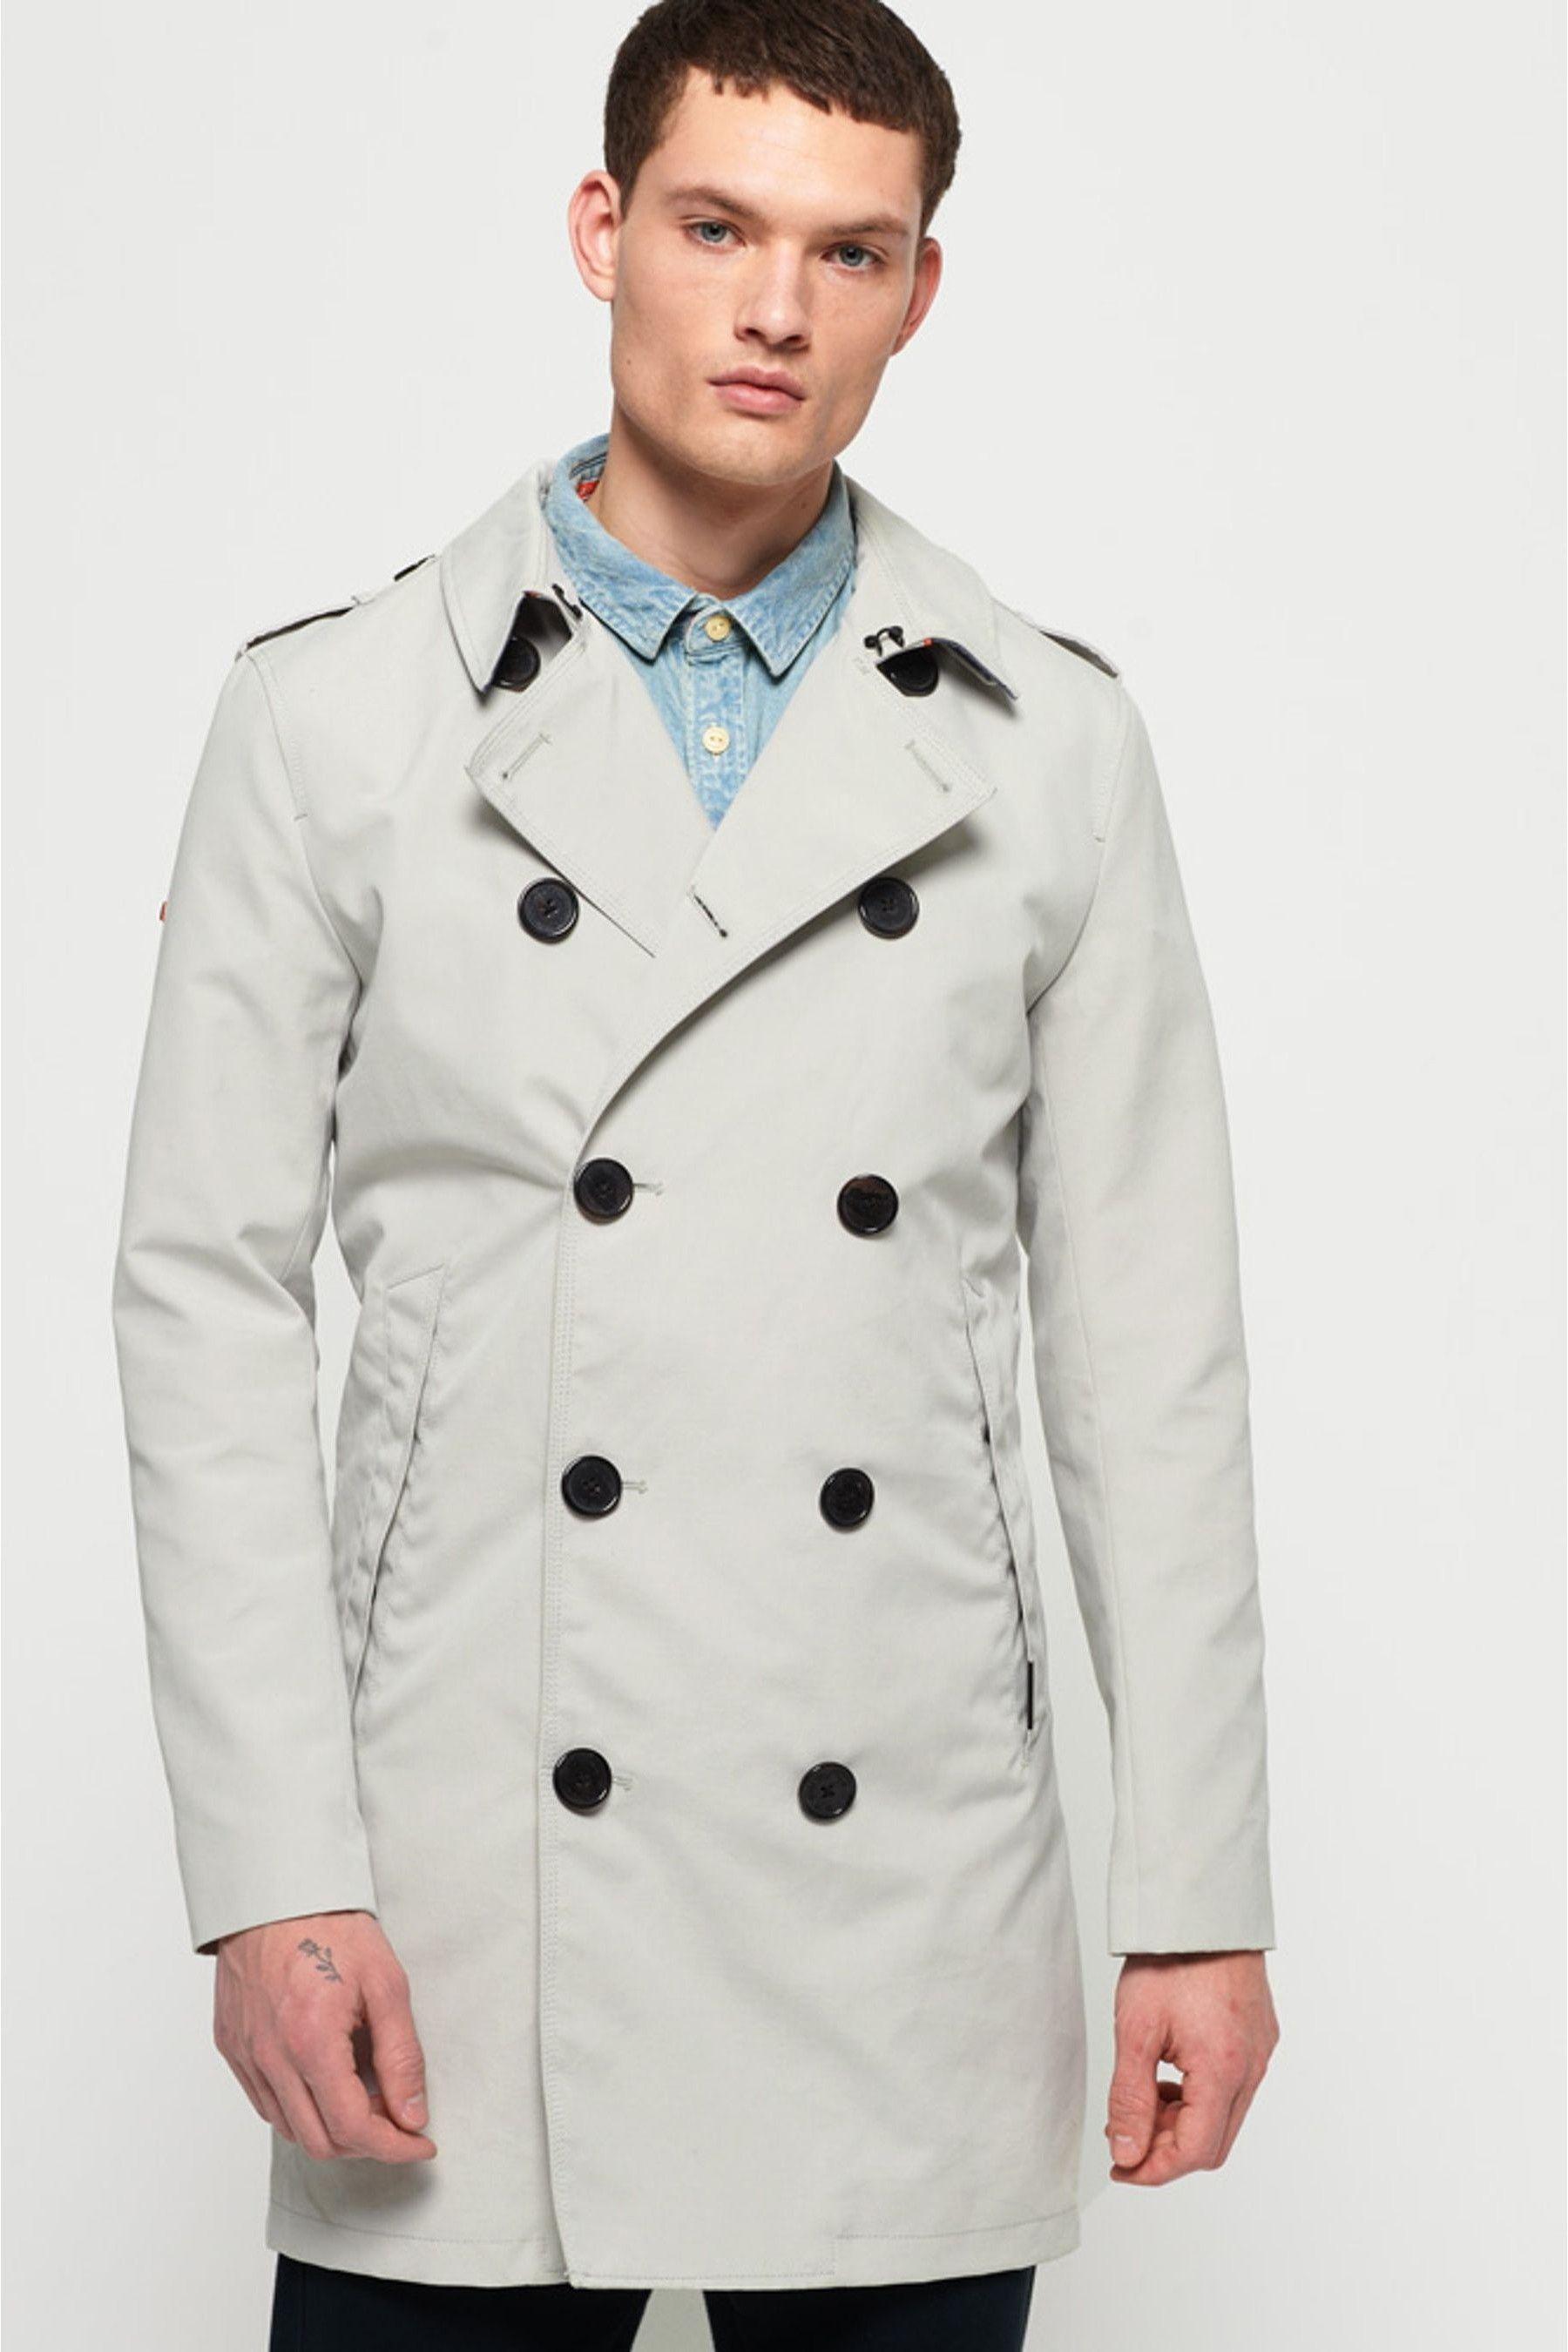 Superdry Summer Rogue Trench Coat | Trench coat men